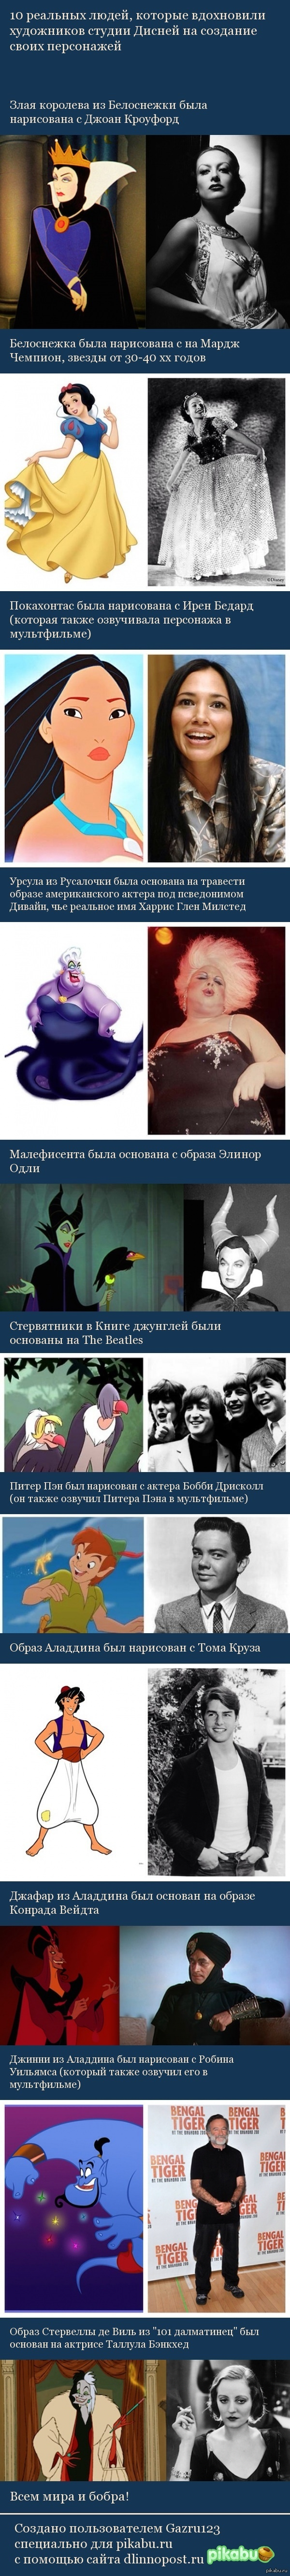 http://s4.pikabu.ru/post_img/2014/08/08/7/1407491389_71842330.jpg